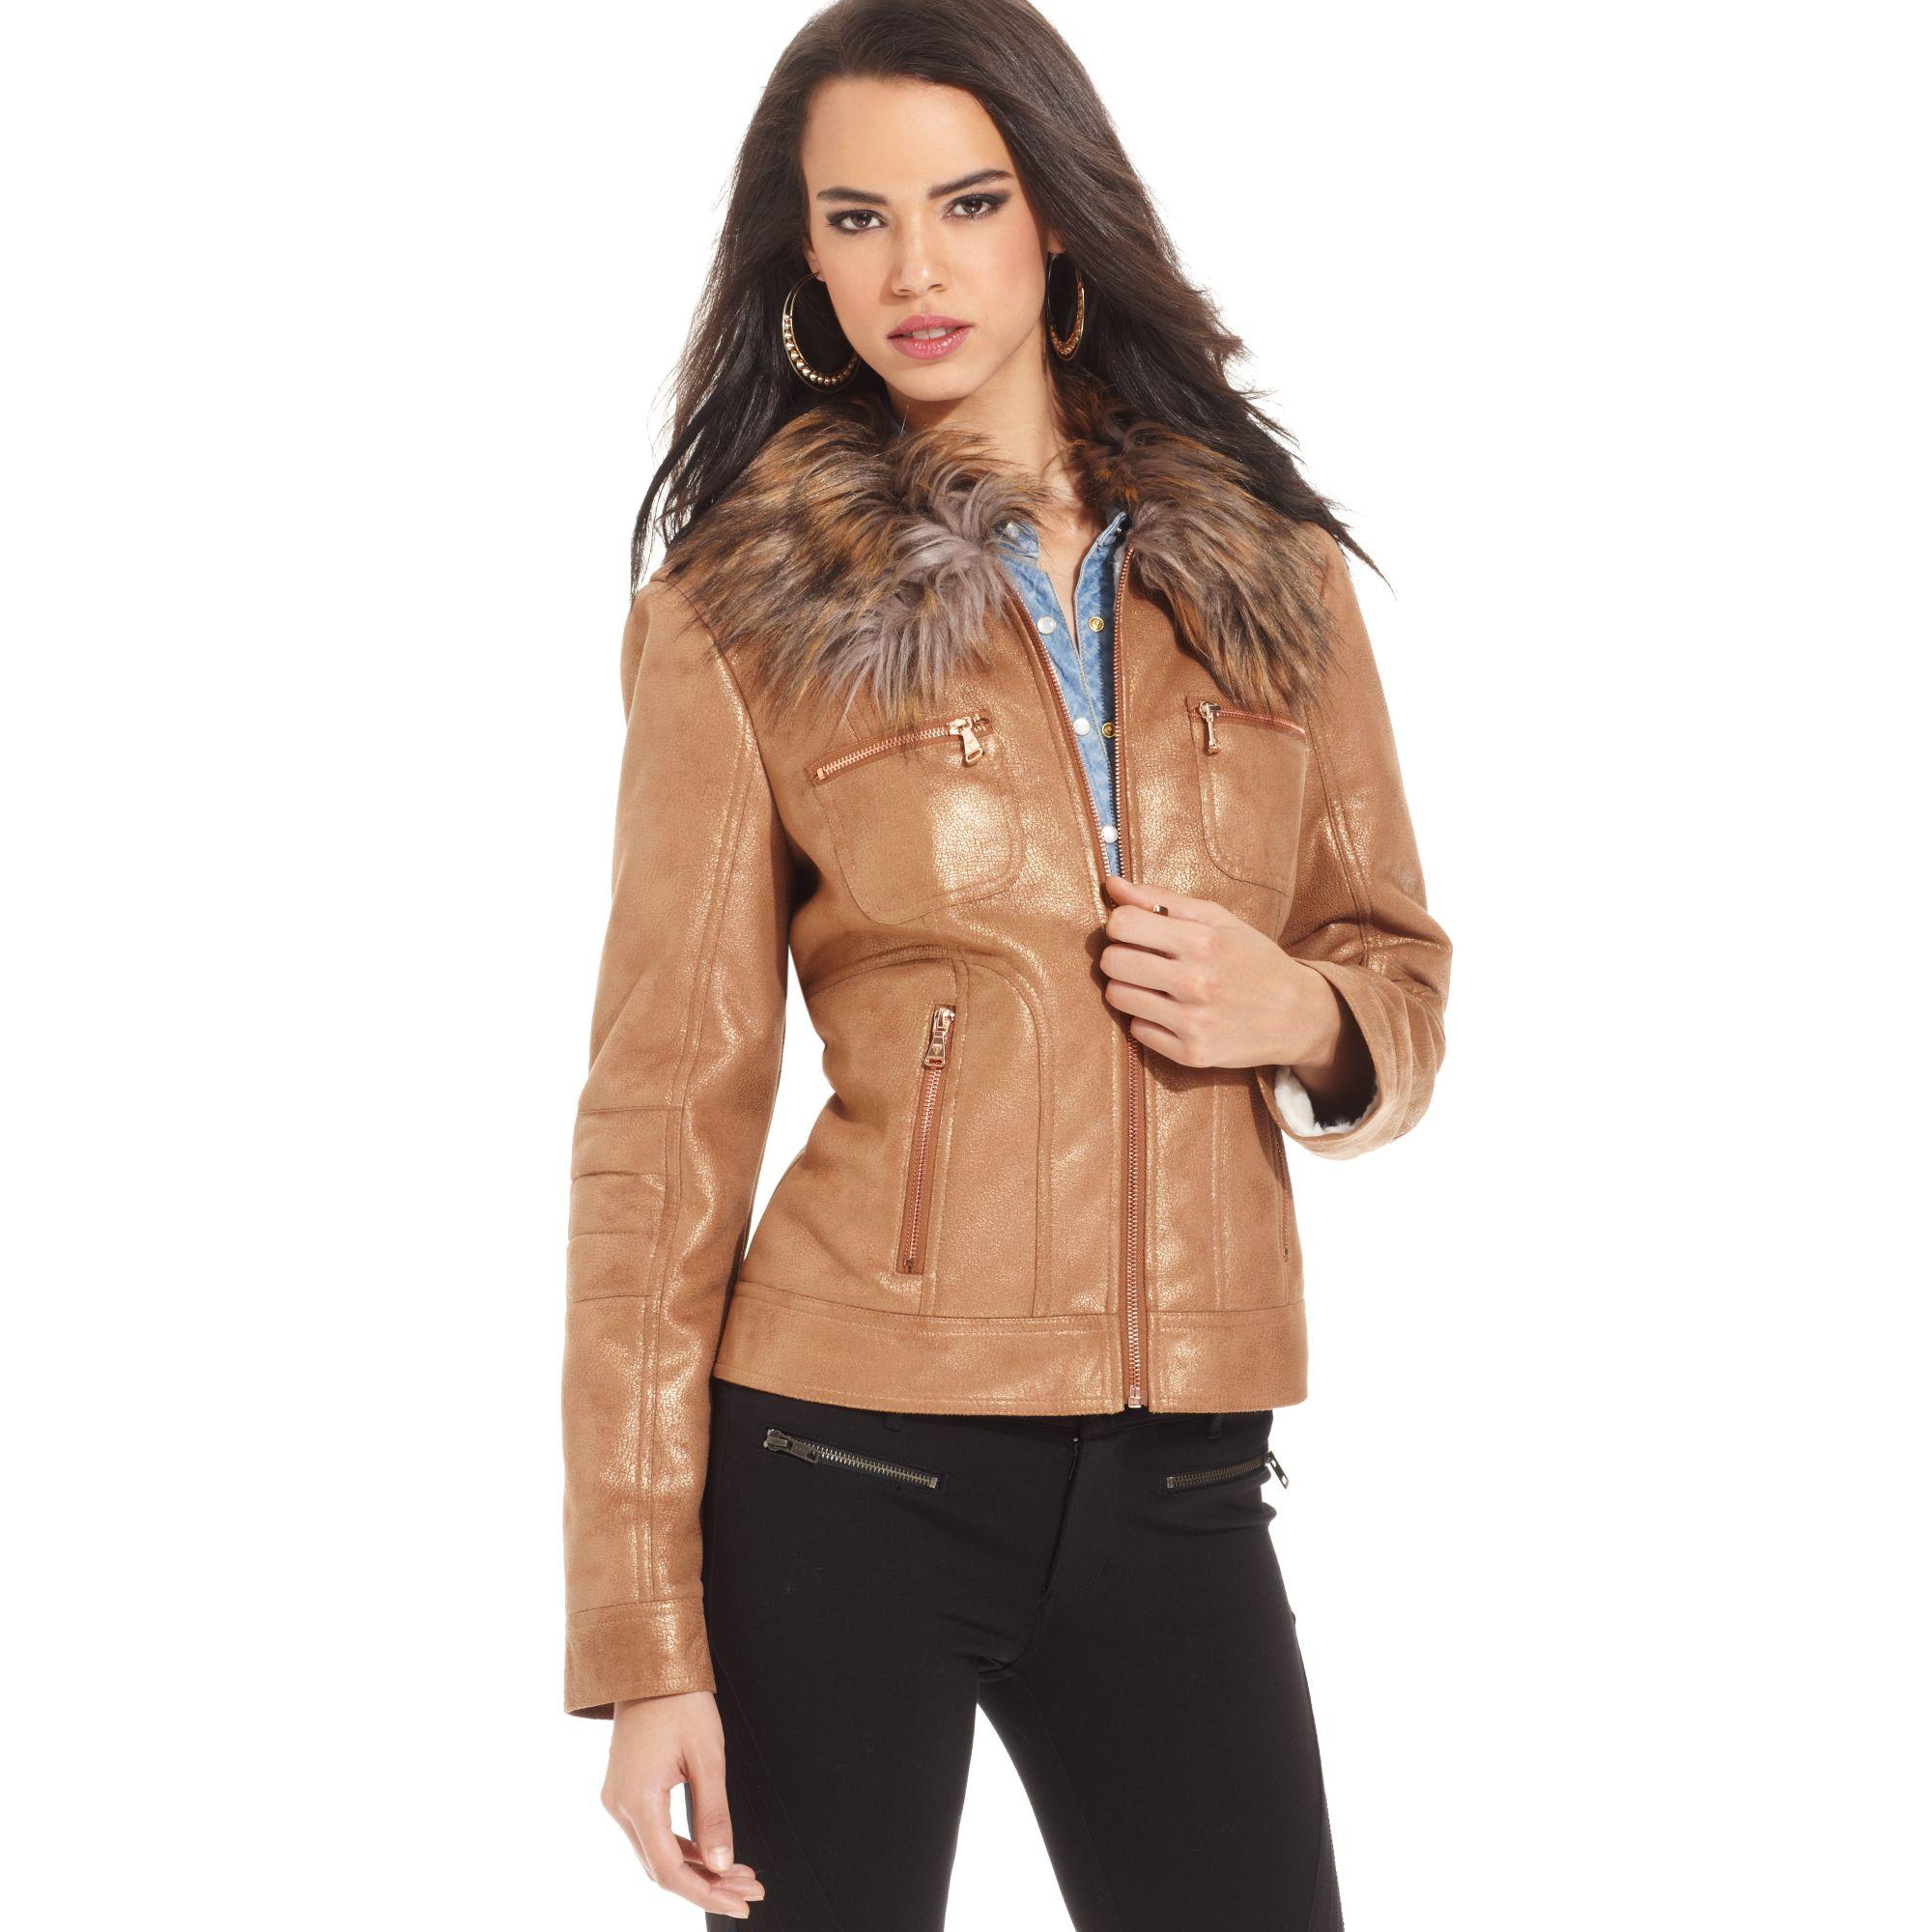 Lyst - Guess Faux fur Metallic Jacket in Brown